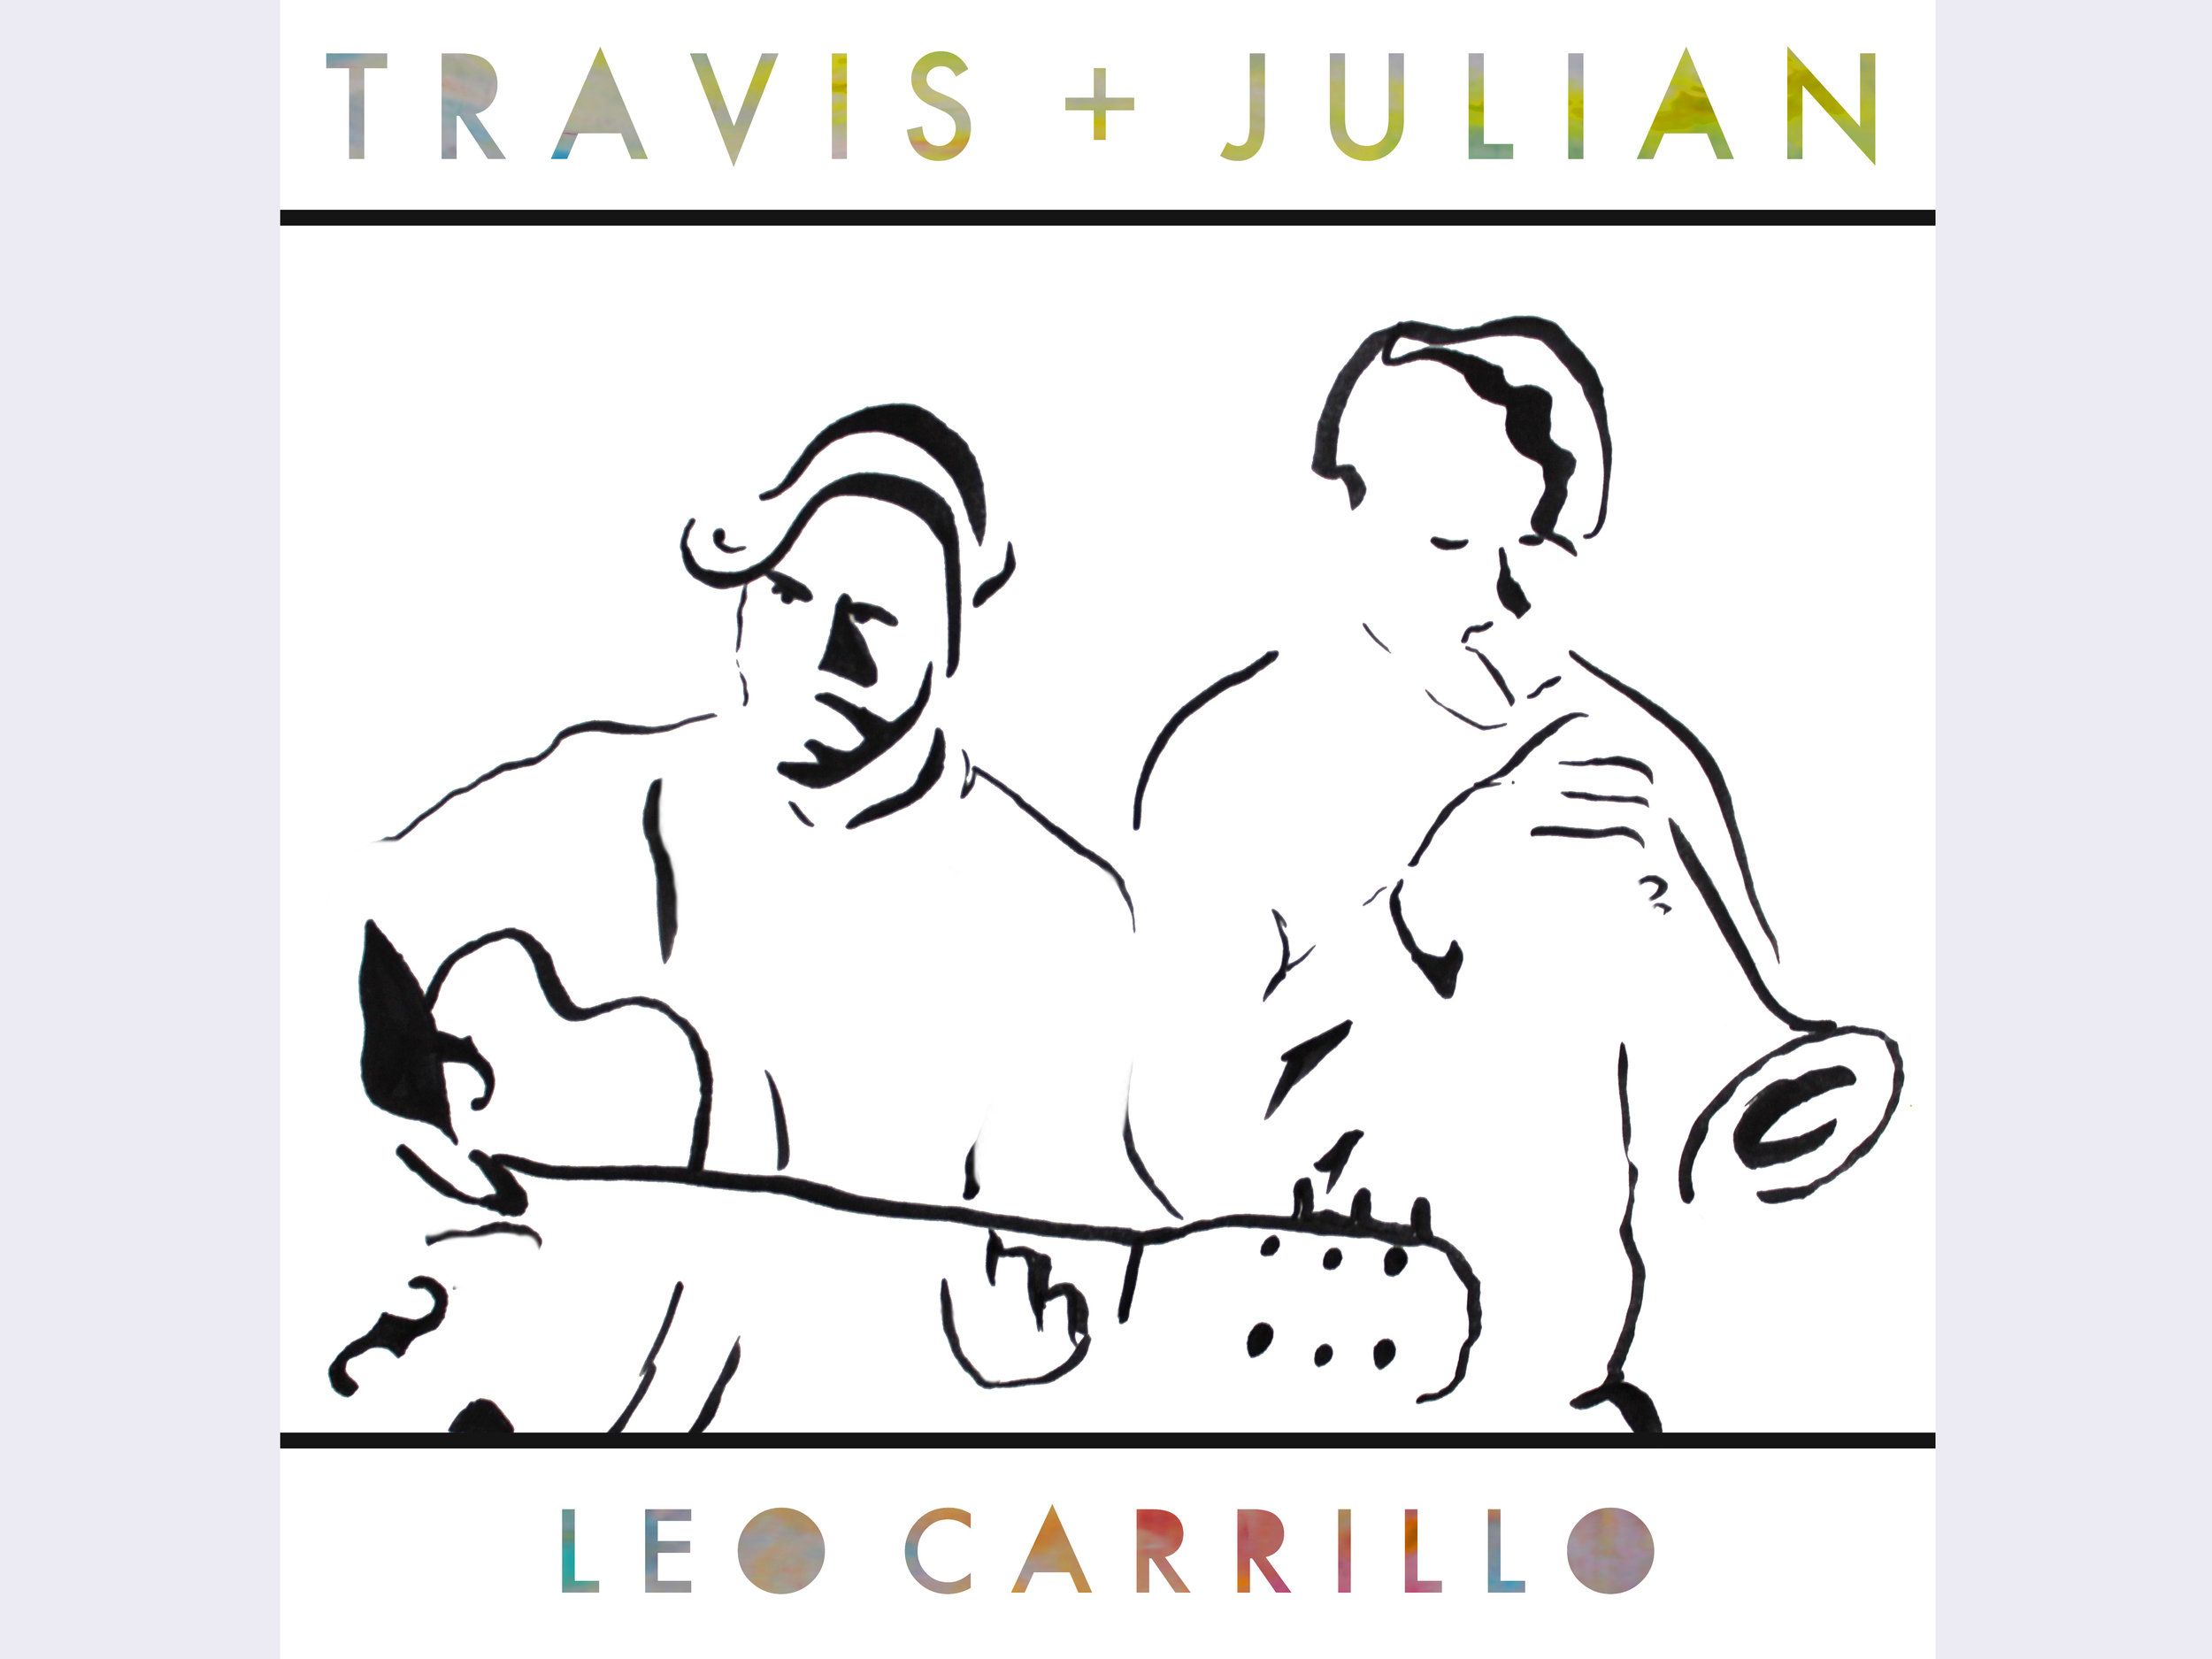 Music Media - Album Covers, Posters